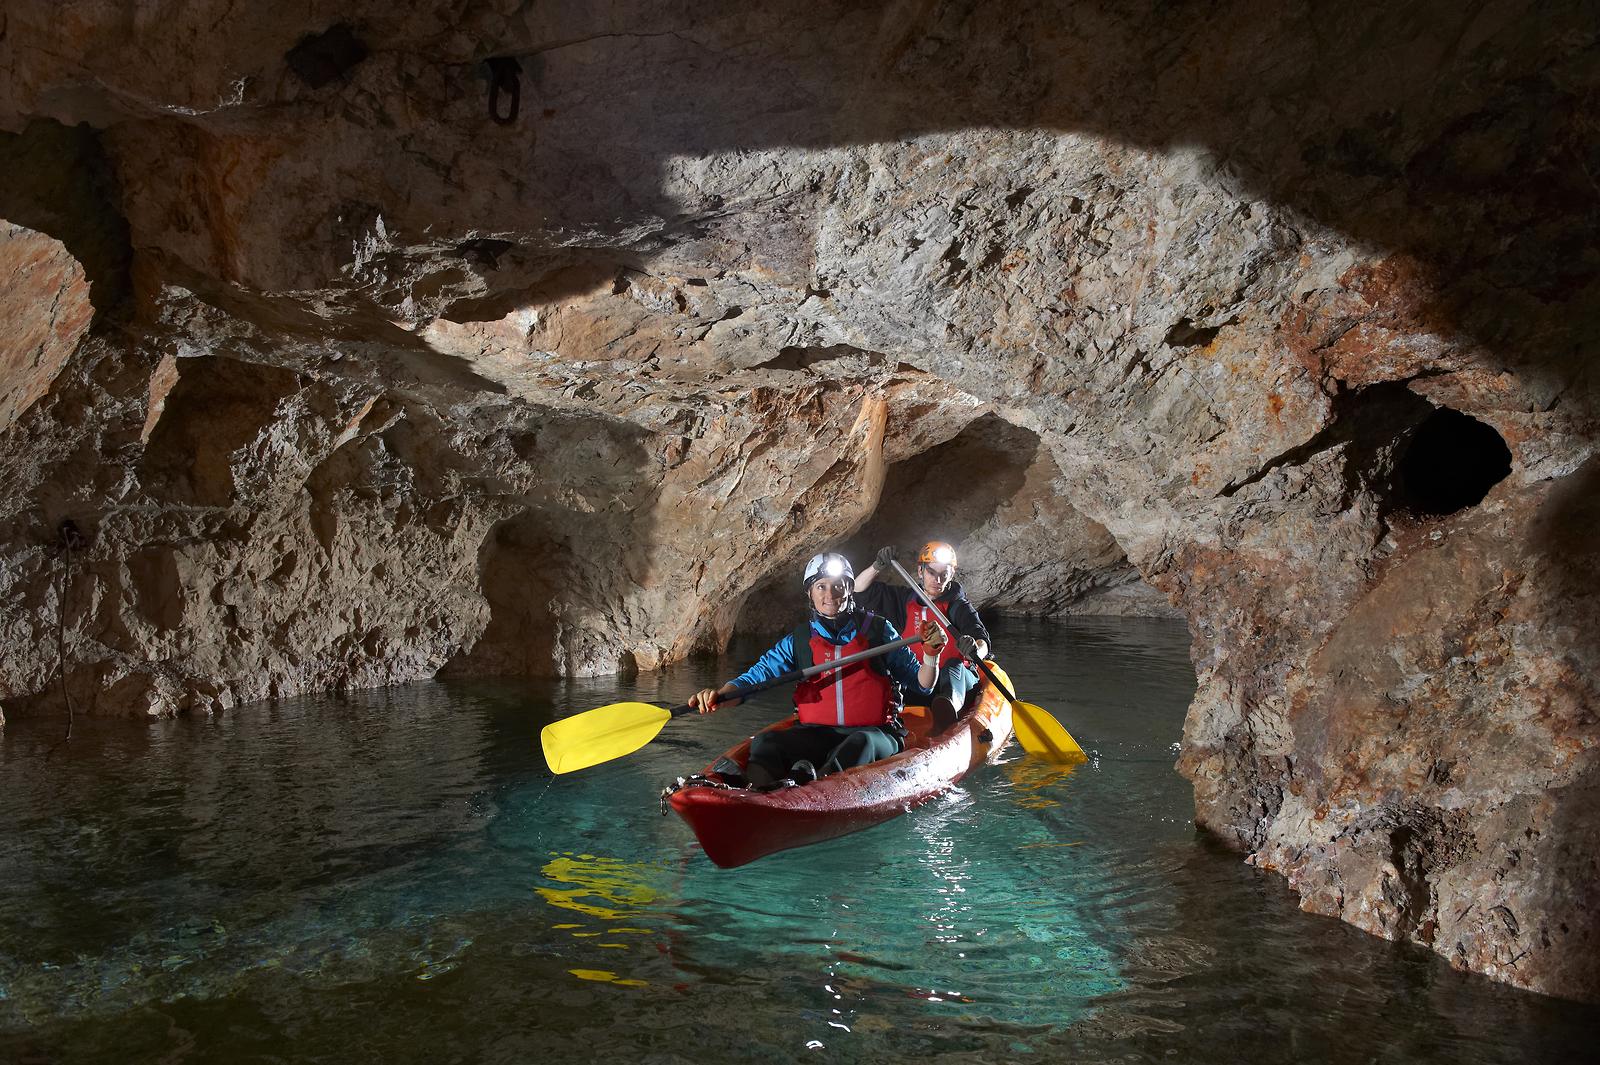 Peca underground kayaking